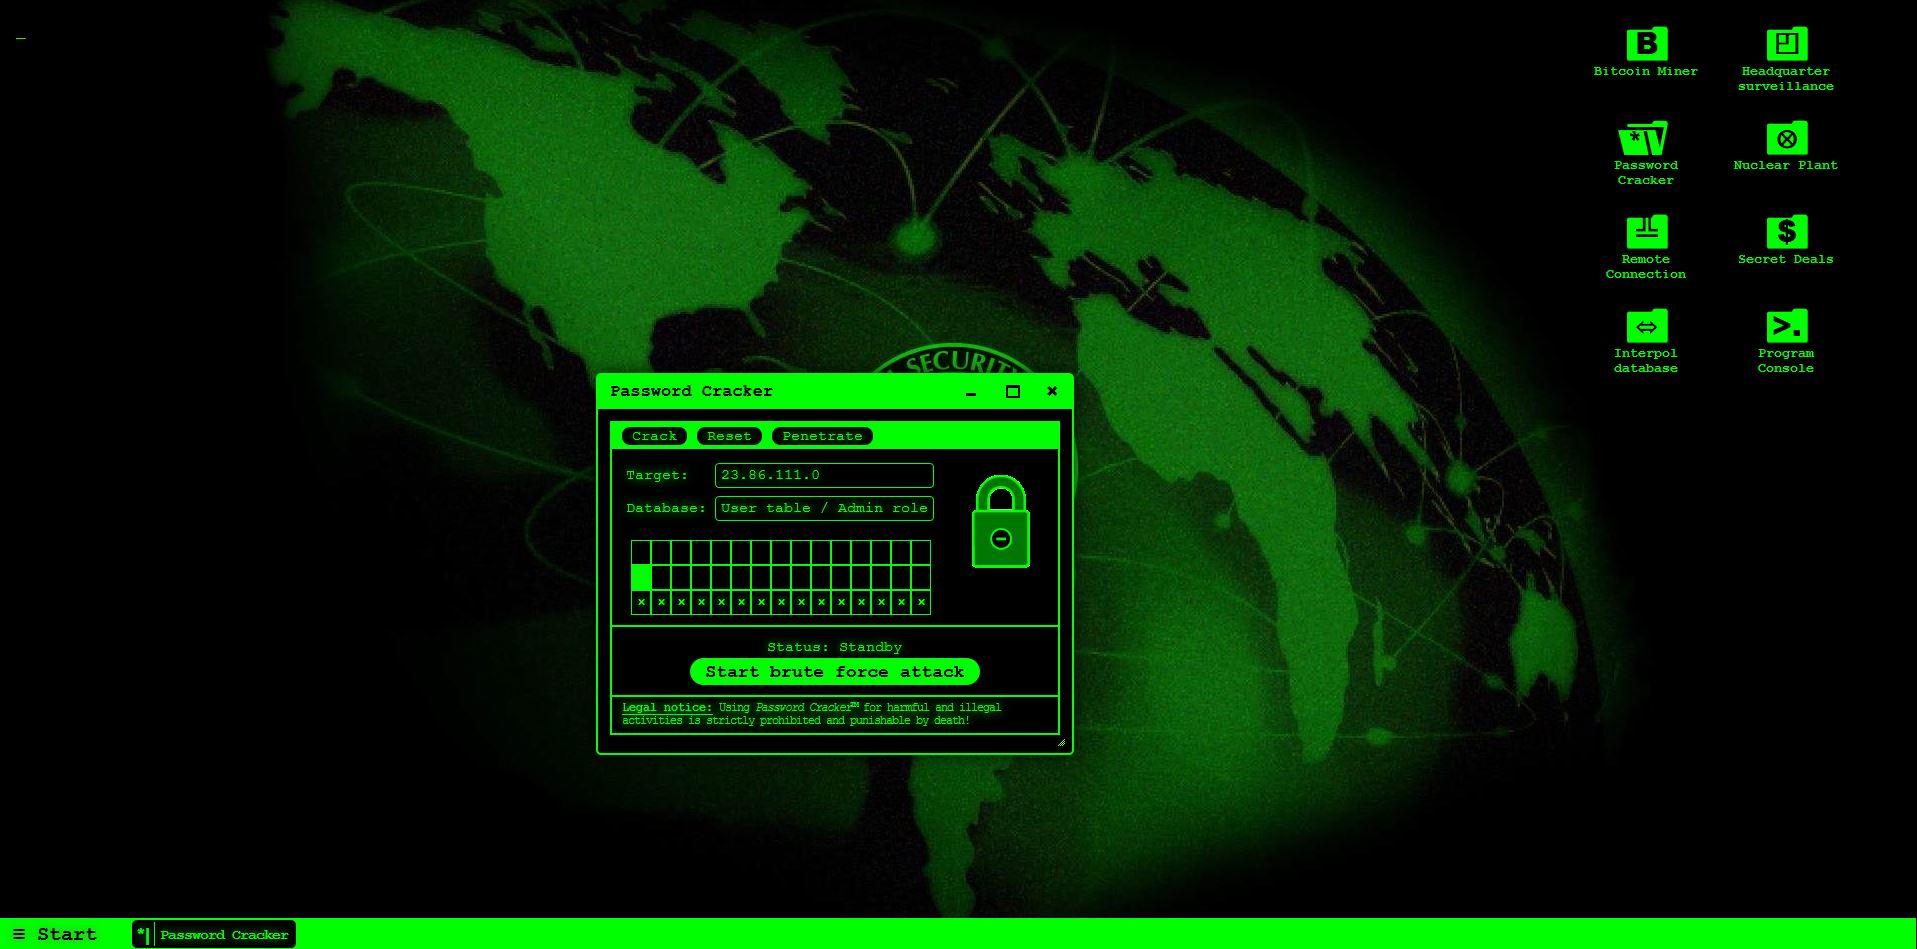 geekprank hacker